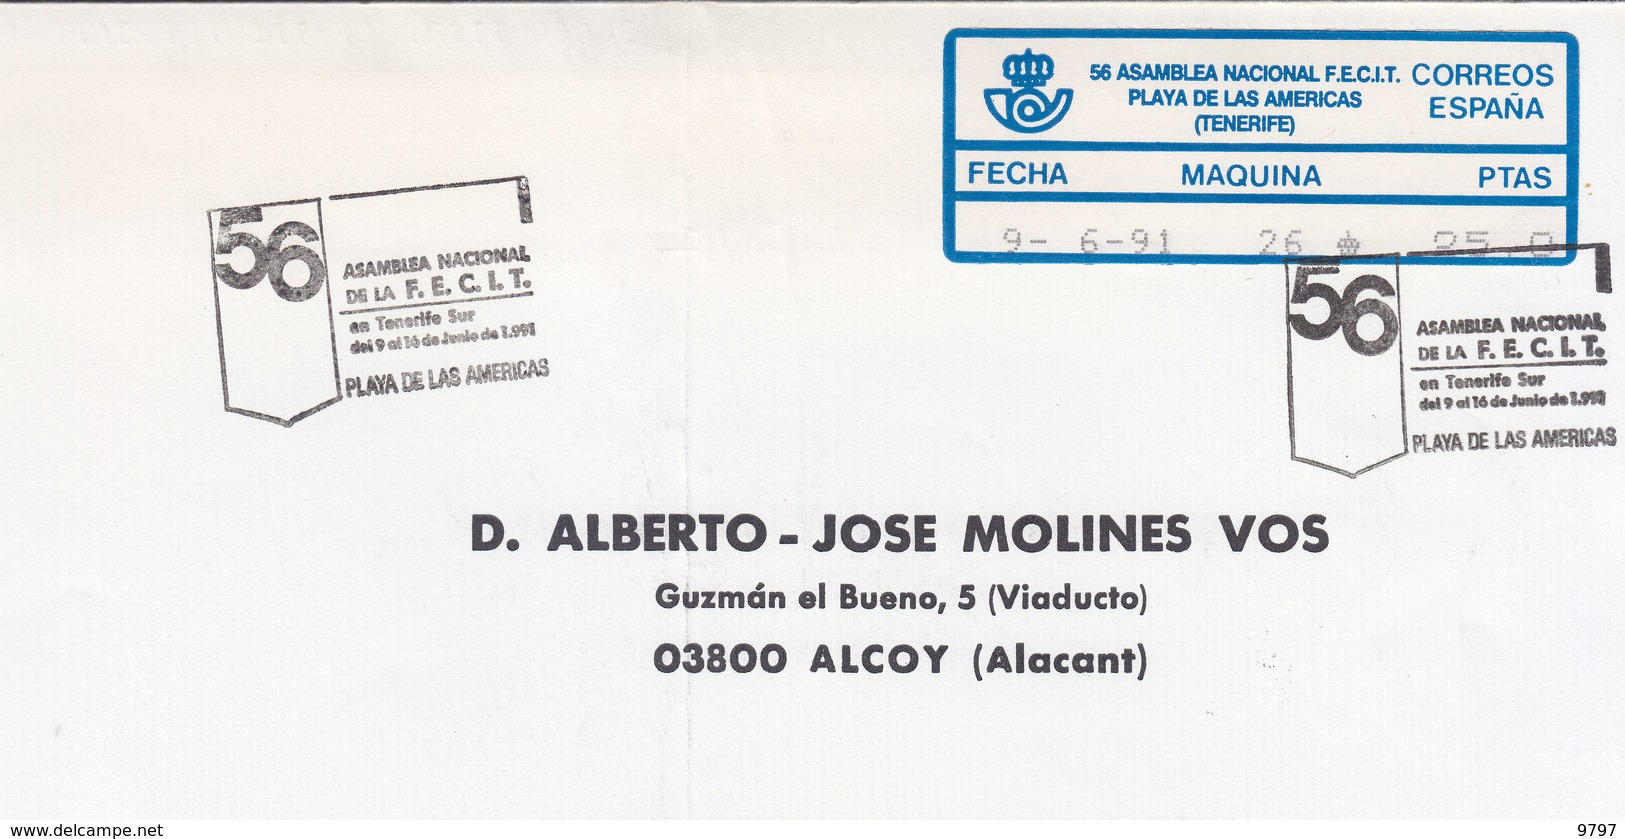 SOBRE CON EPELSA Nº 26 Y M.E. DE LA 56 ASAMBLEA NACIONAL F.E.C.I.T. - PLAYA DE LAS AMERICAS TENERIFE - ETIQUETA ESCASA - ATM - Frama (viñetas)